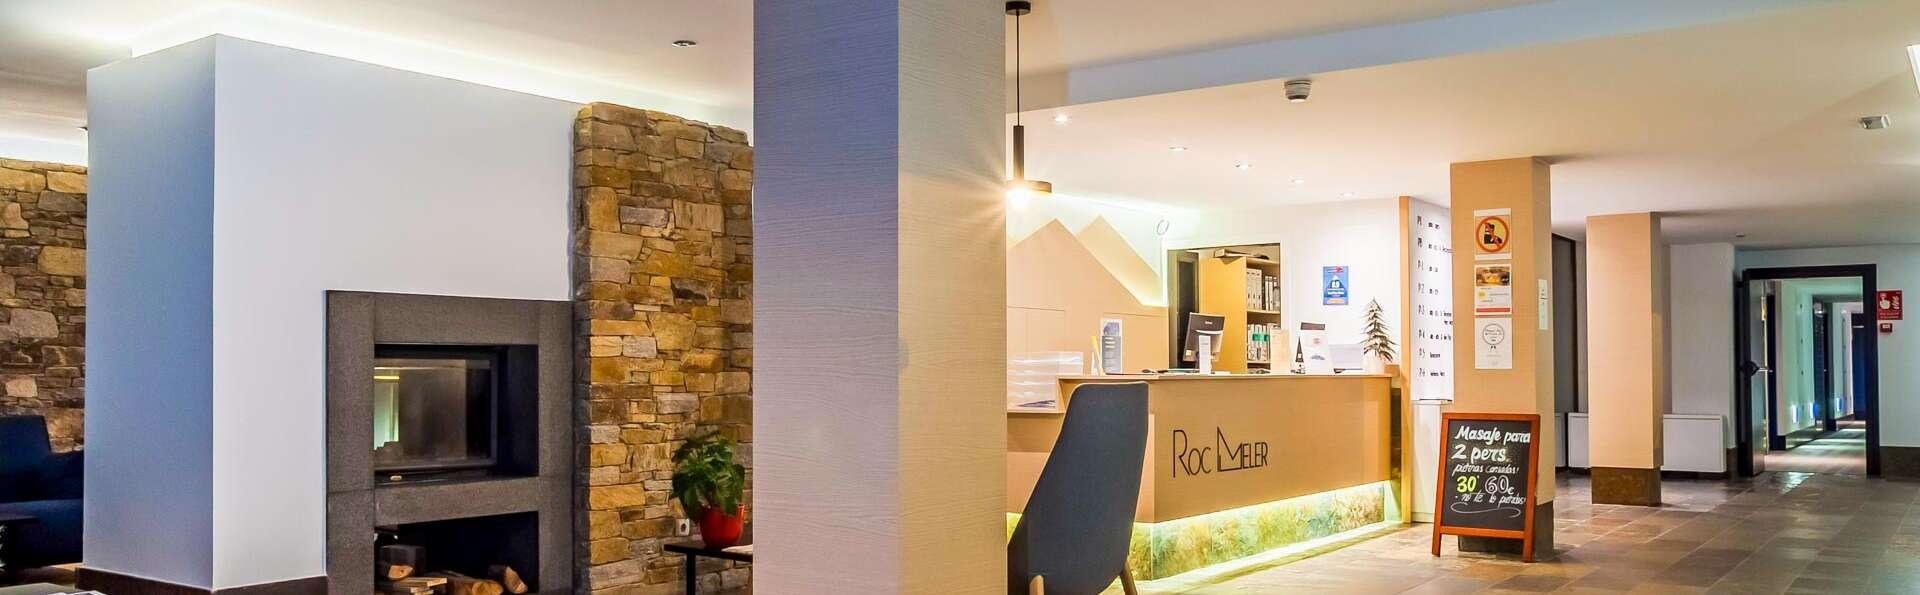 Hotel Roc Meler - EDIT_N2_LOBBY_01.jpg